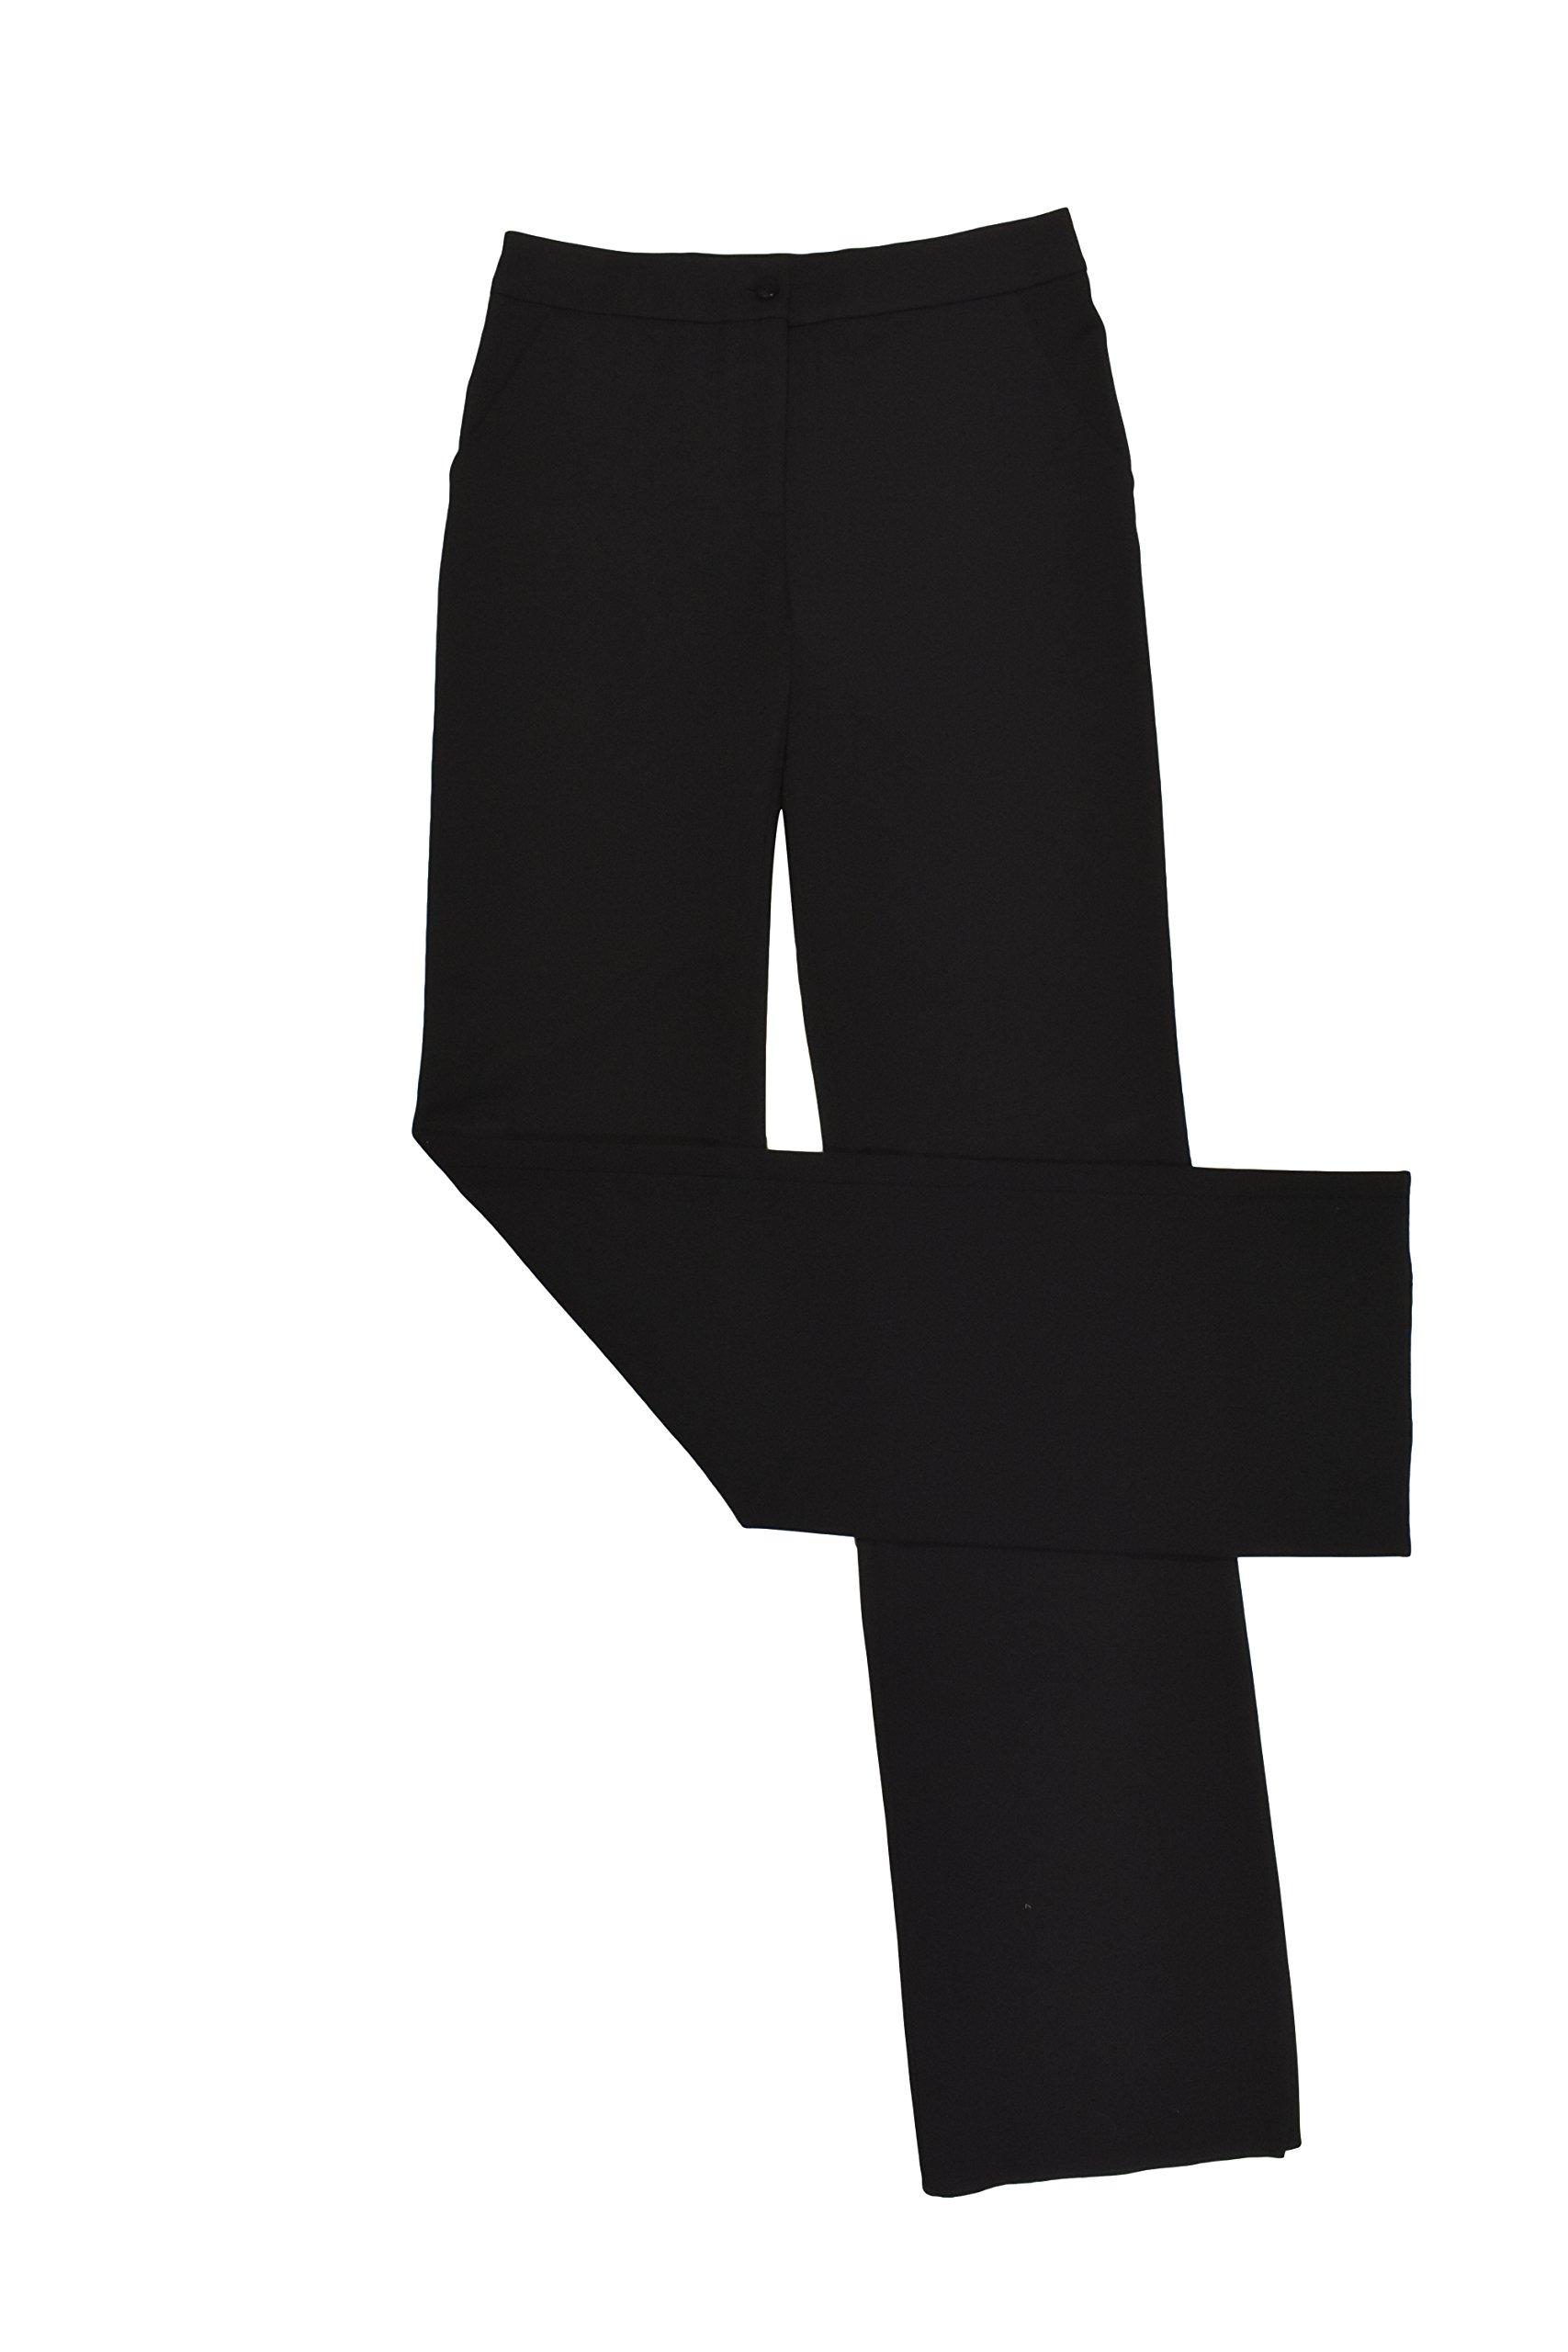 Salvatore Ferragamo Black High Waist Pants 38